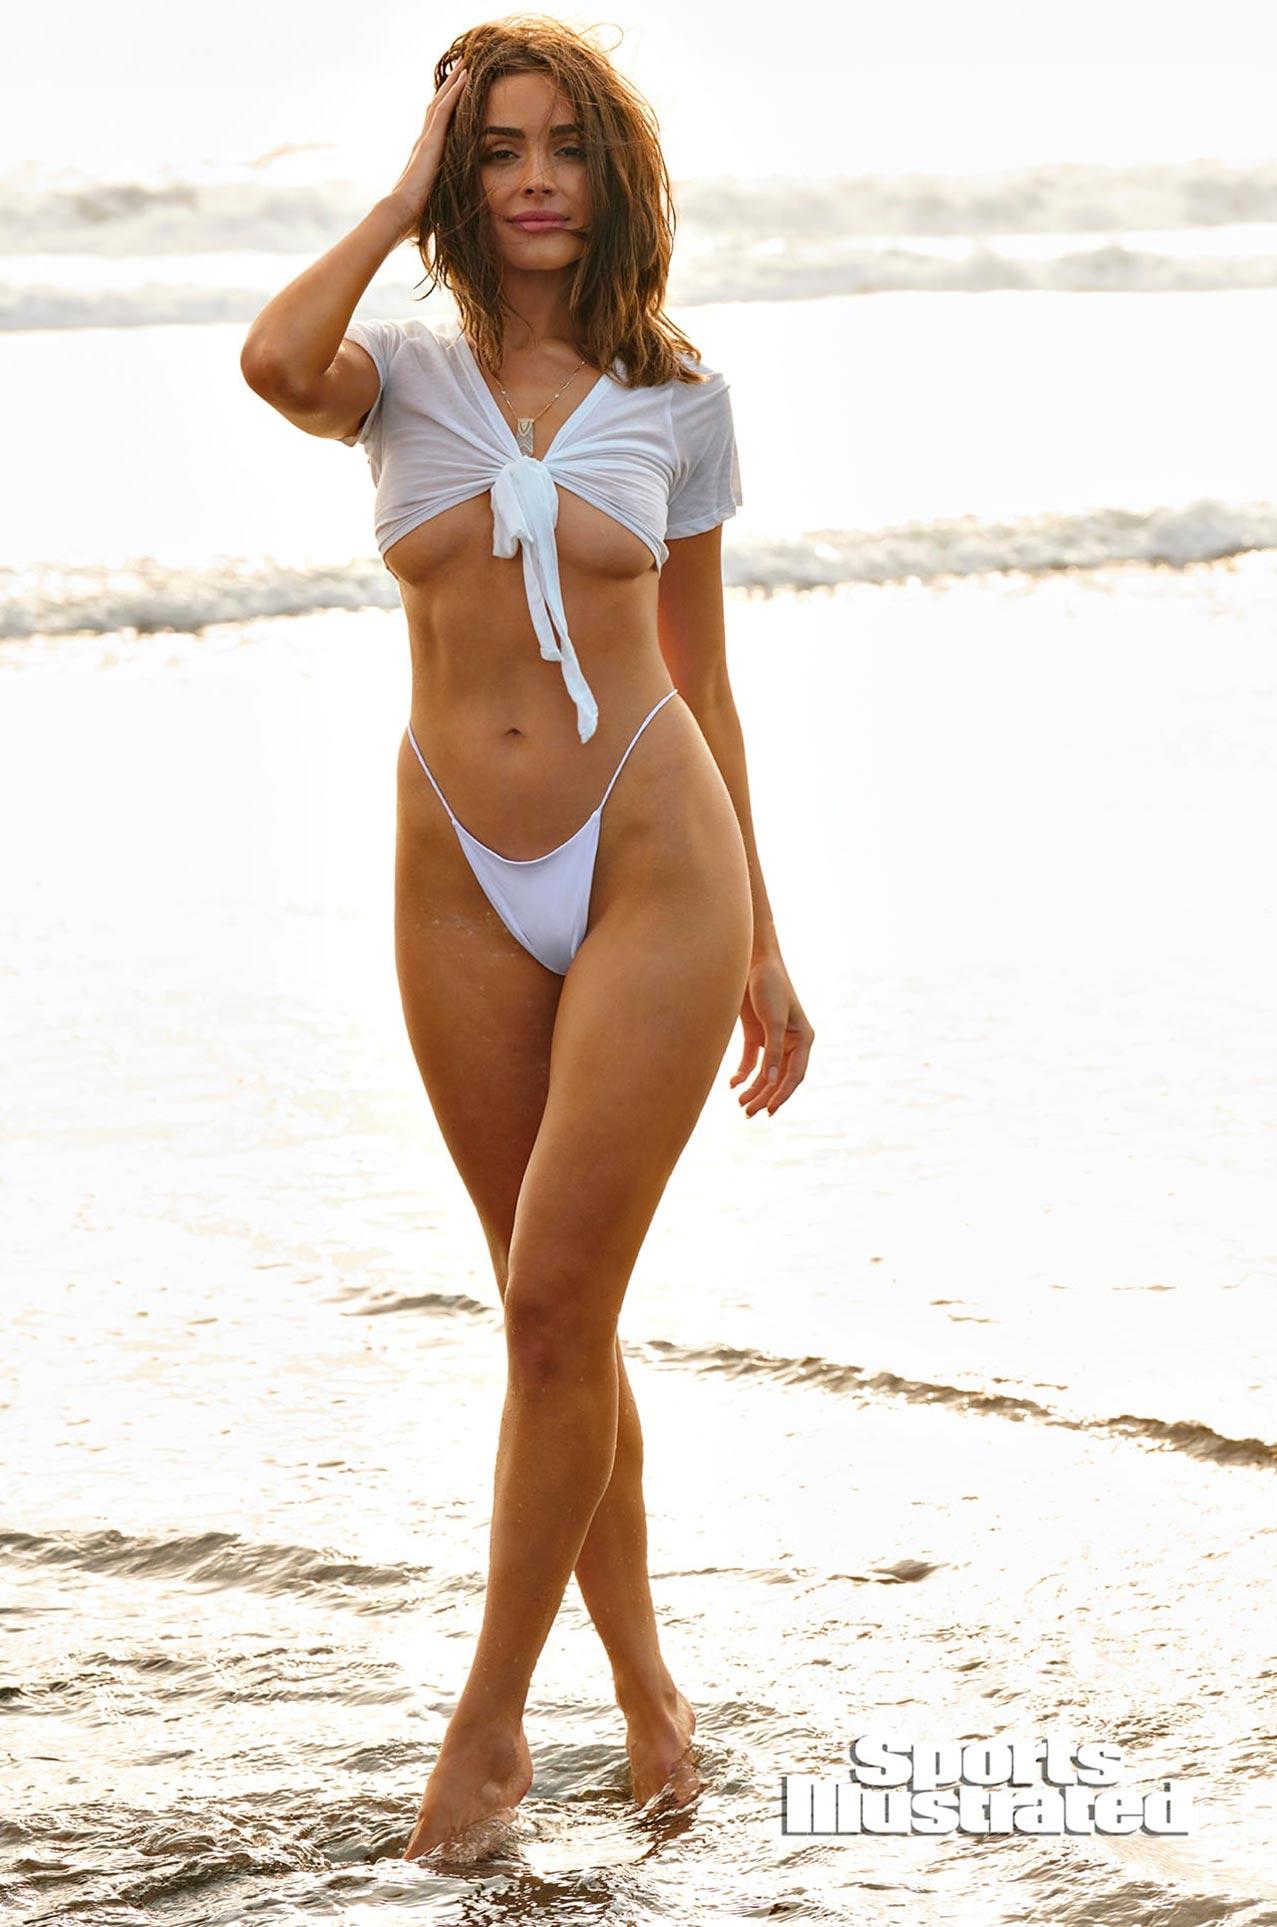 Оливия Калпо в каталоге купальников Sports Illustrated Swimsuit 2020 / фото 17